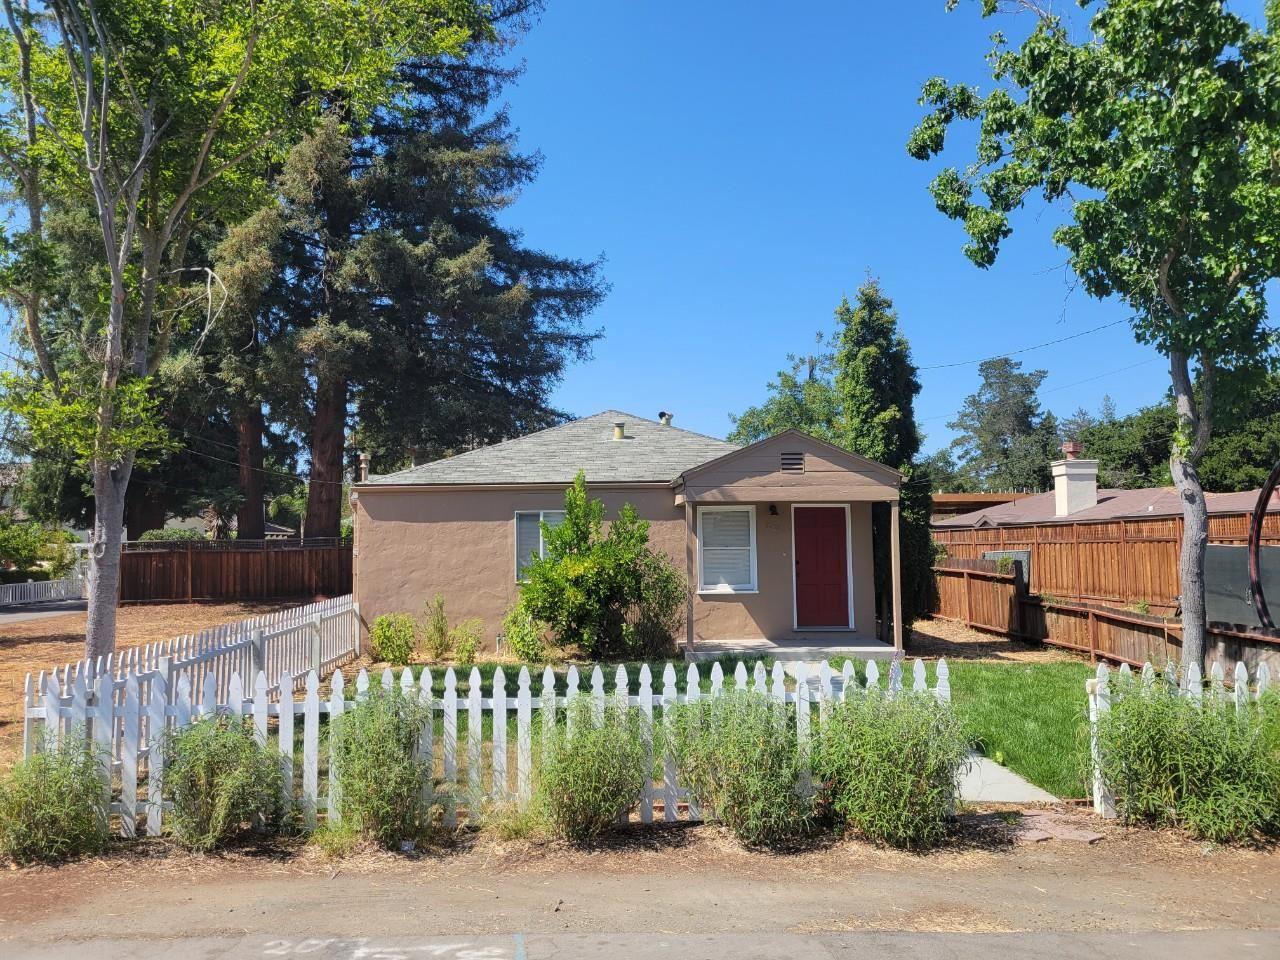 Photo for 441 Mundell Way, LOS ALTOS, CA 94022 (MLS # ML81853168)